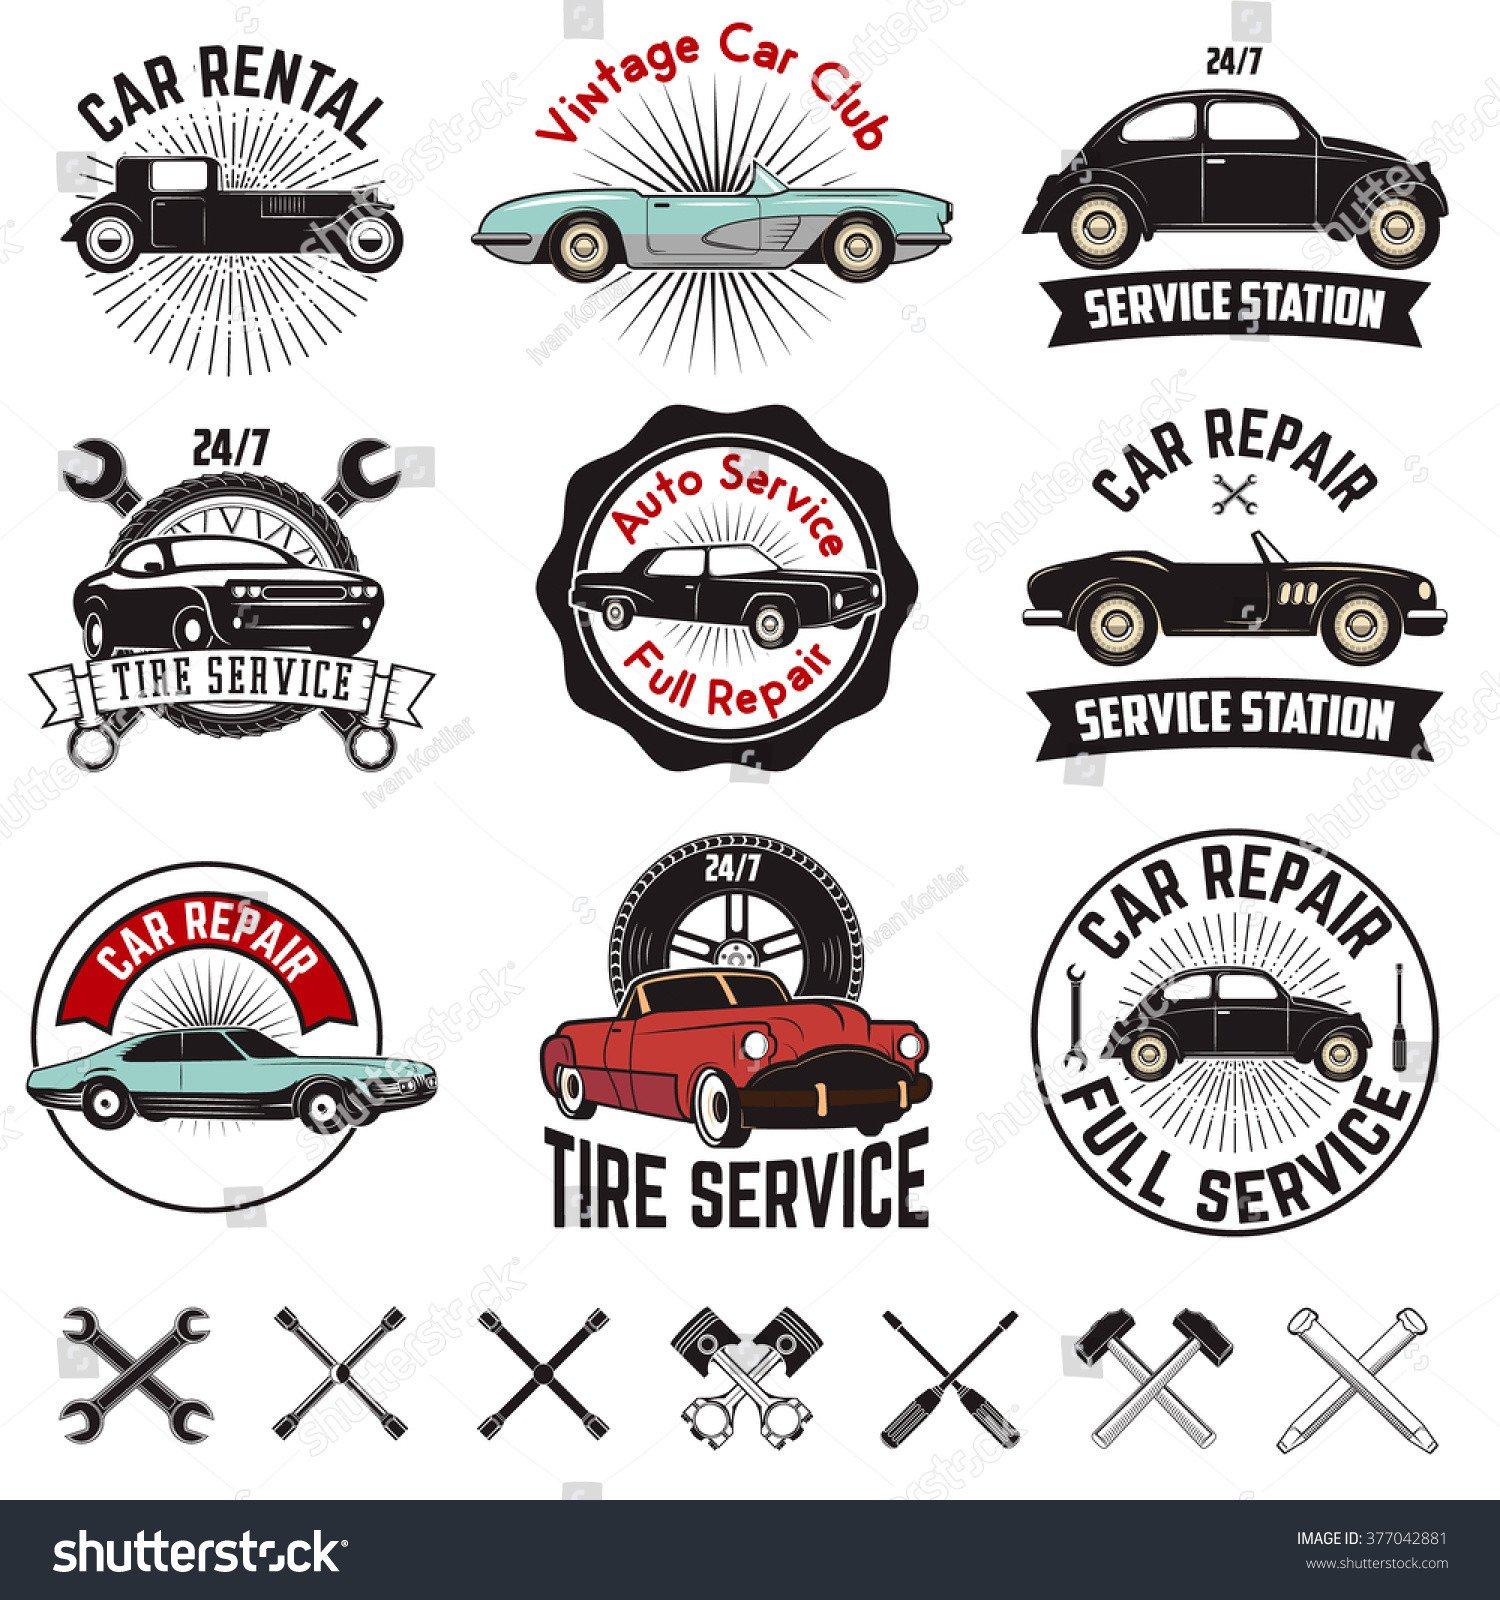 Auto Repair Logo Templates Set Car Repair Service Labels Retro Vector Design